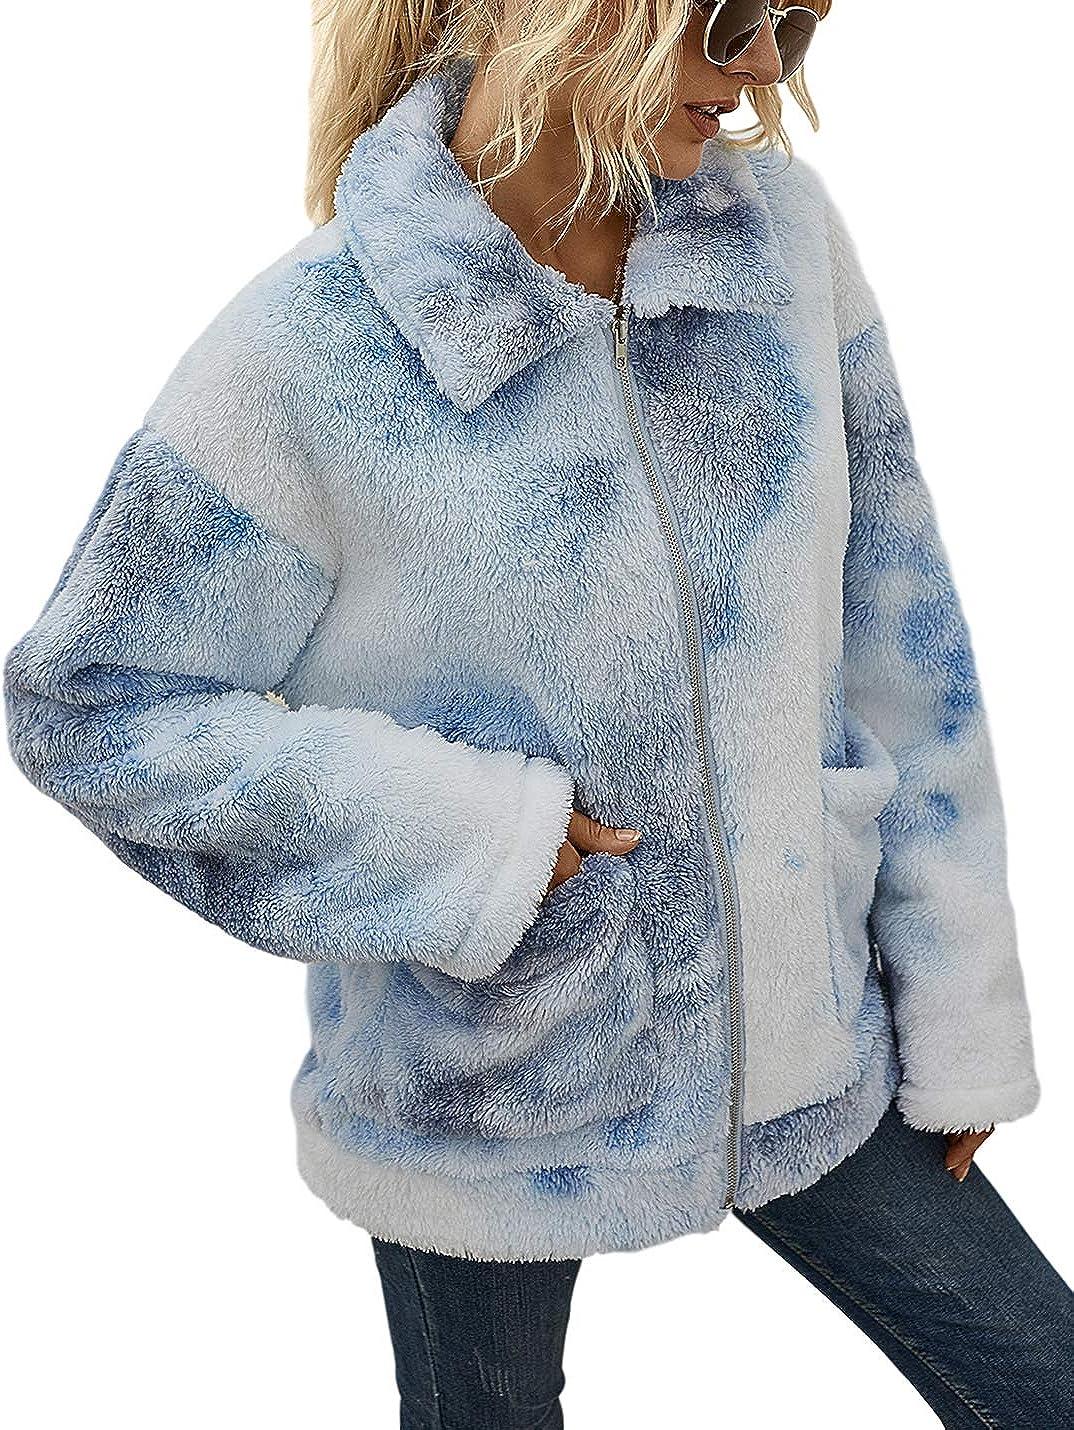 Uaneo Womens Tie Dye Fleece Casual Loose Lapel Zip Up Long Sleeve Jacket Coat(Blue-M)